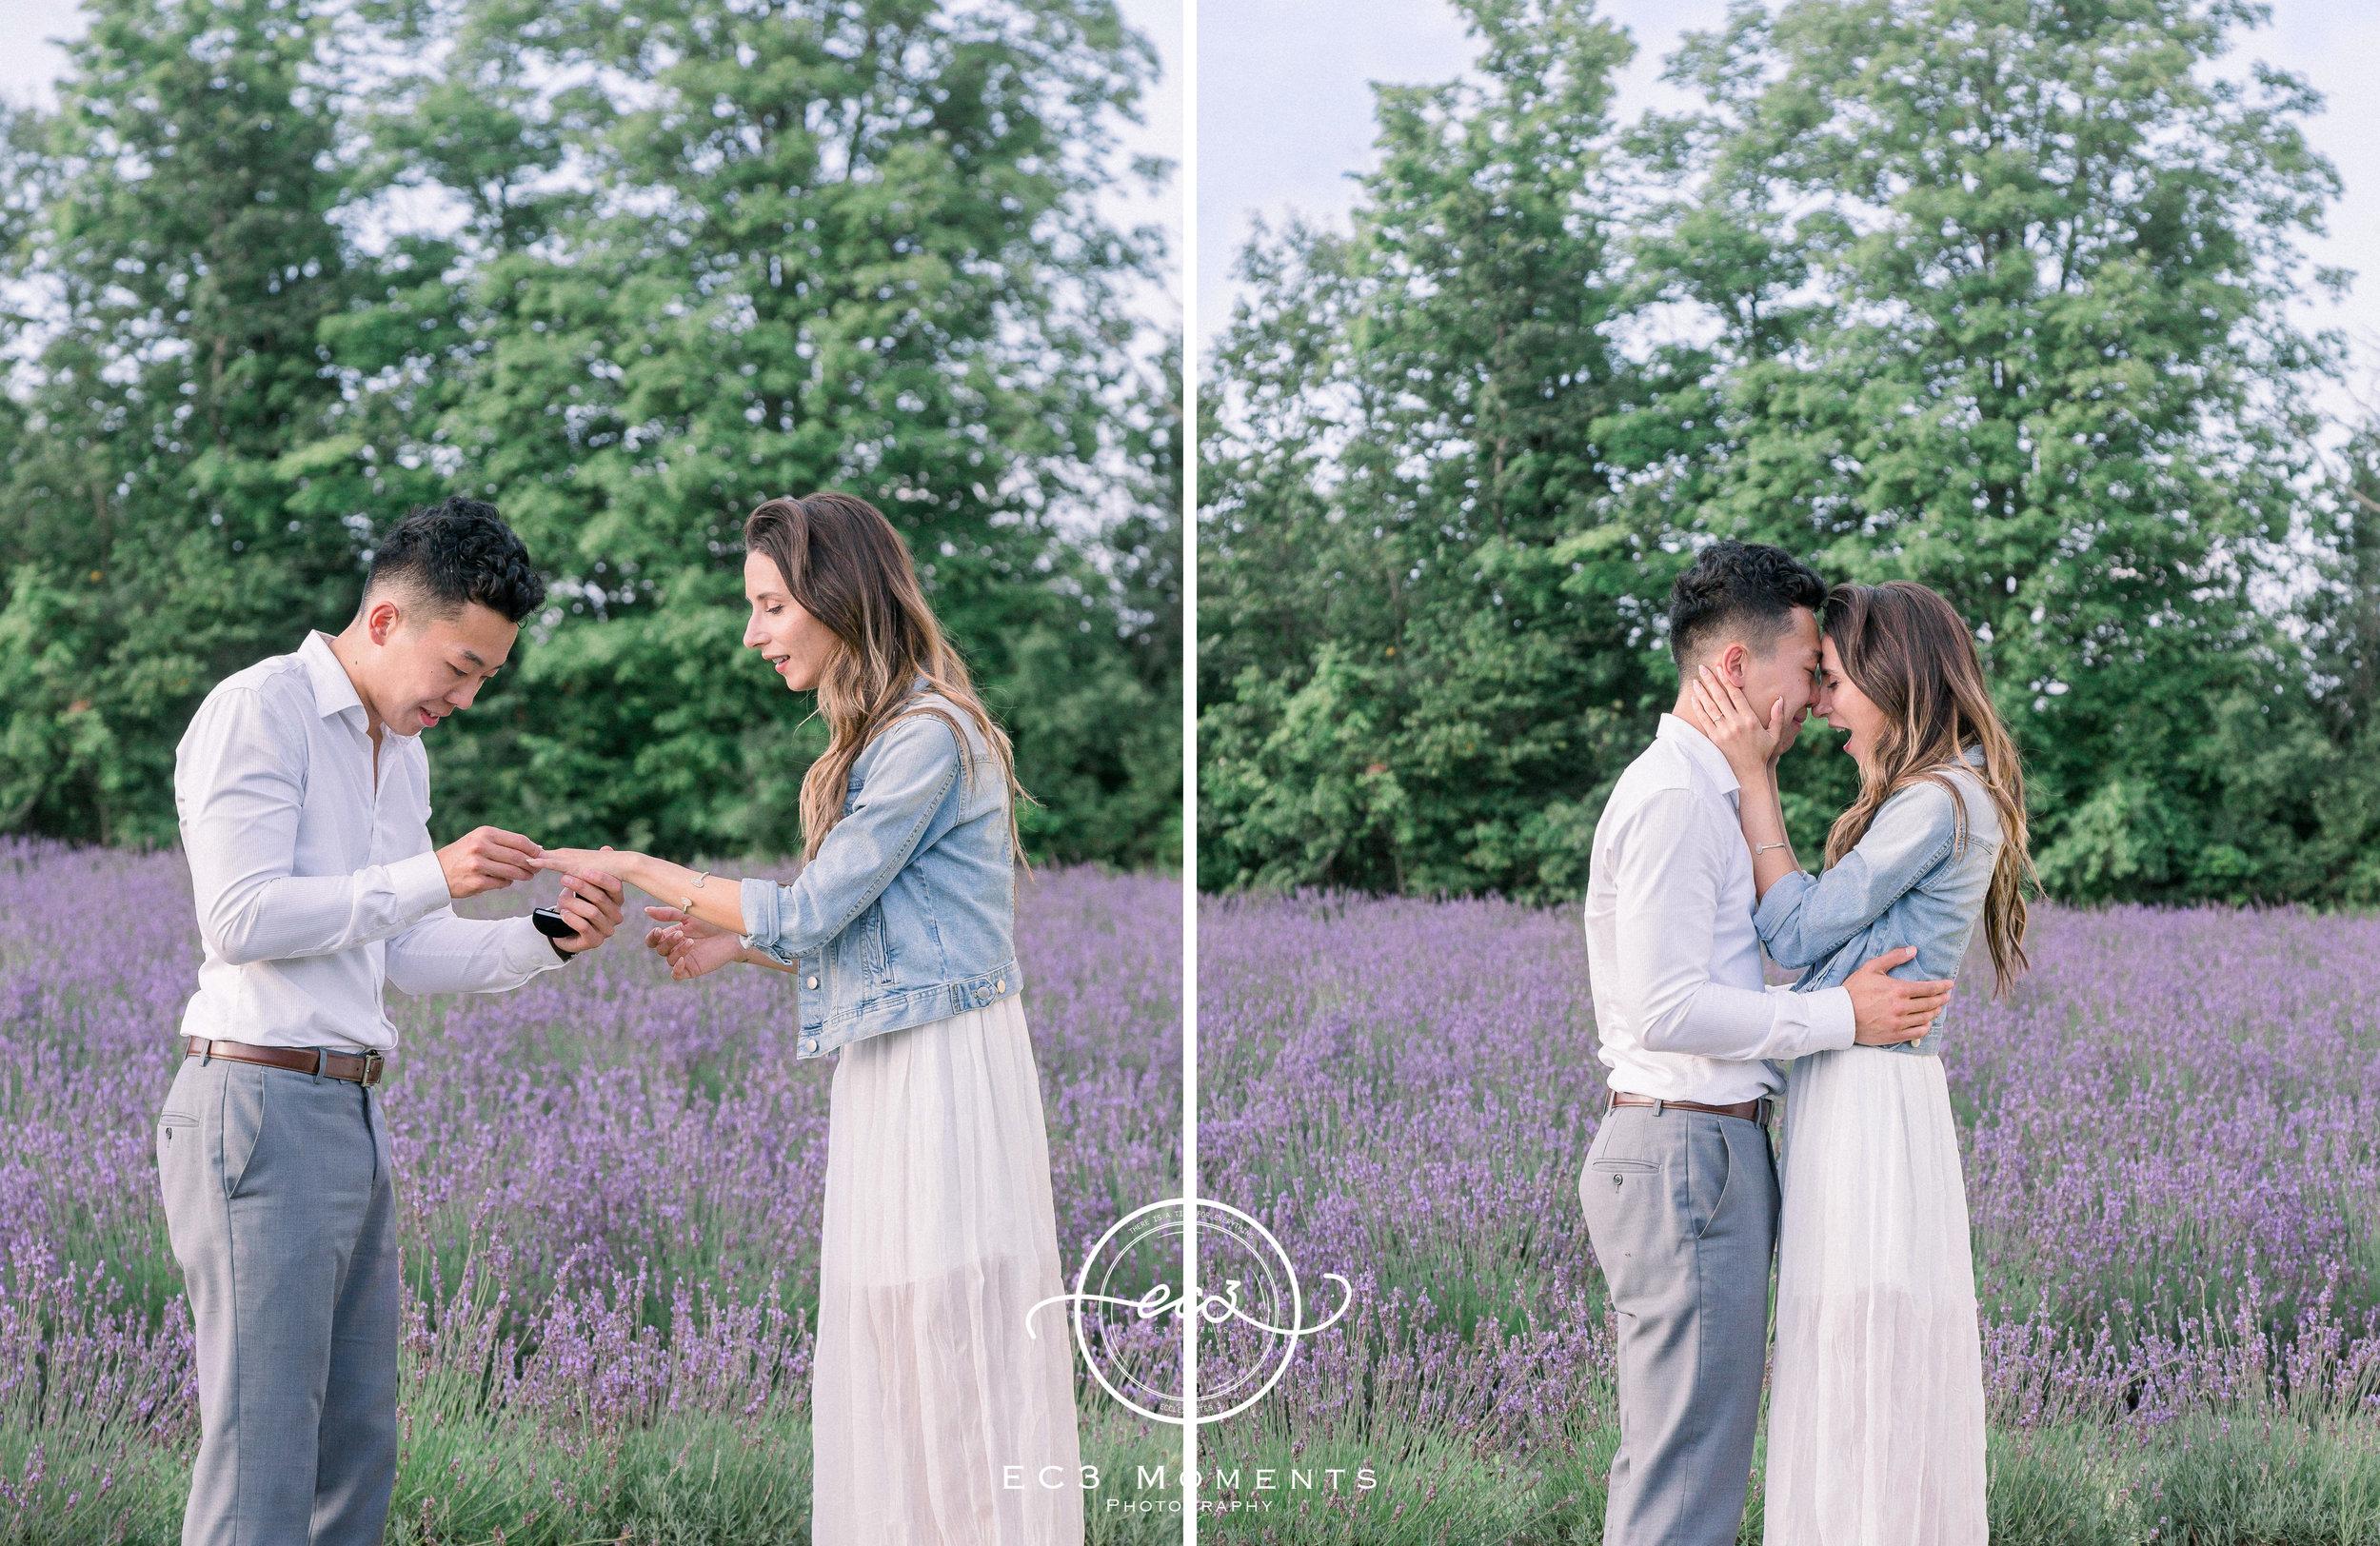 Laura & Ryan Terre Bleu Summer Surprise Proposal 11.jpg